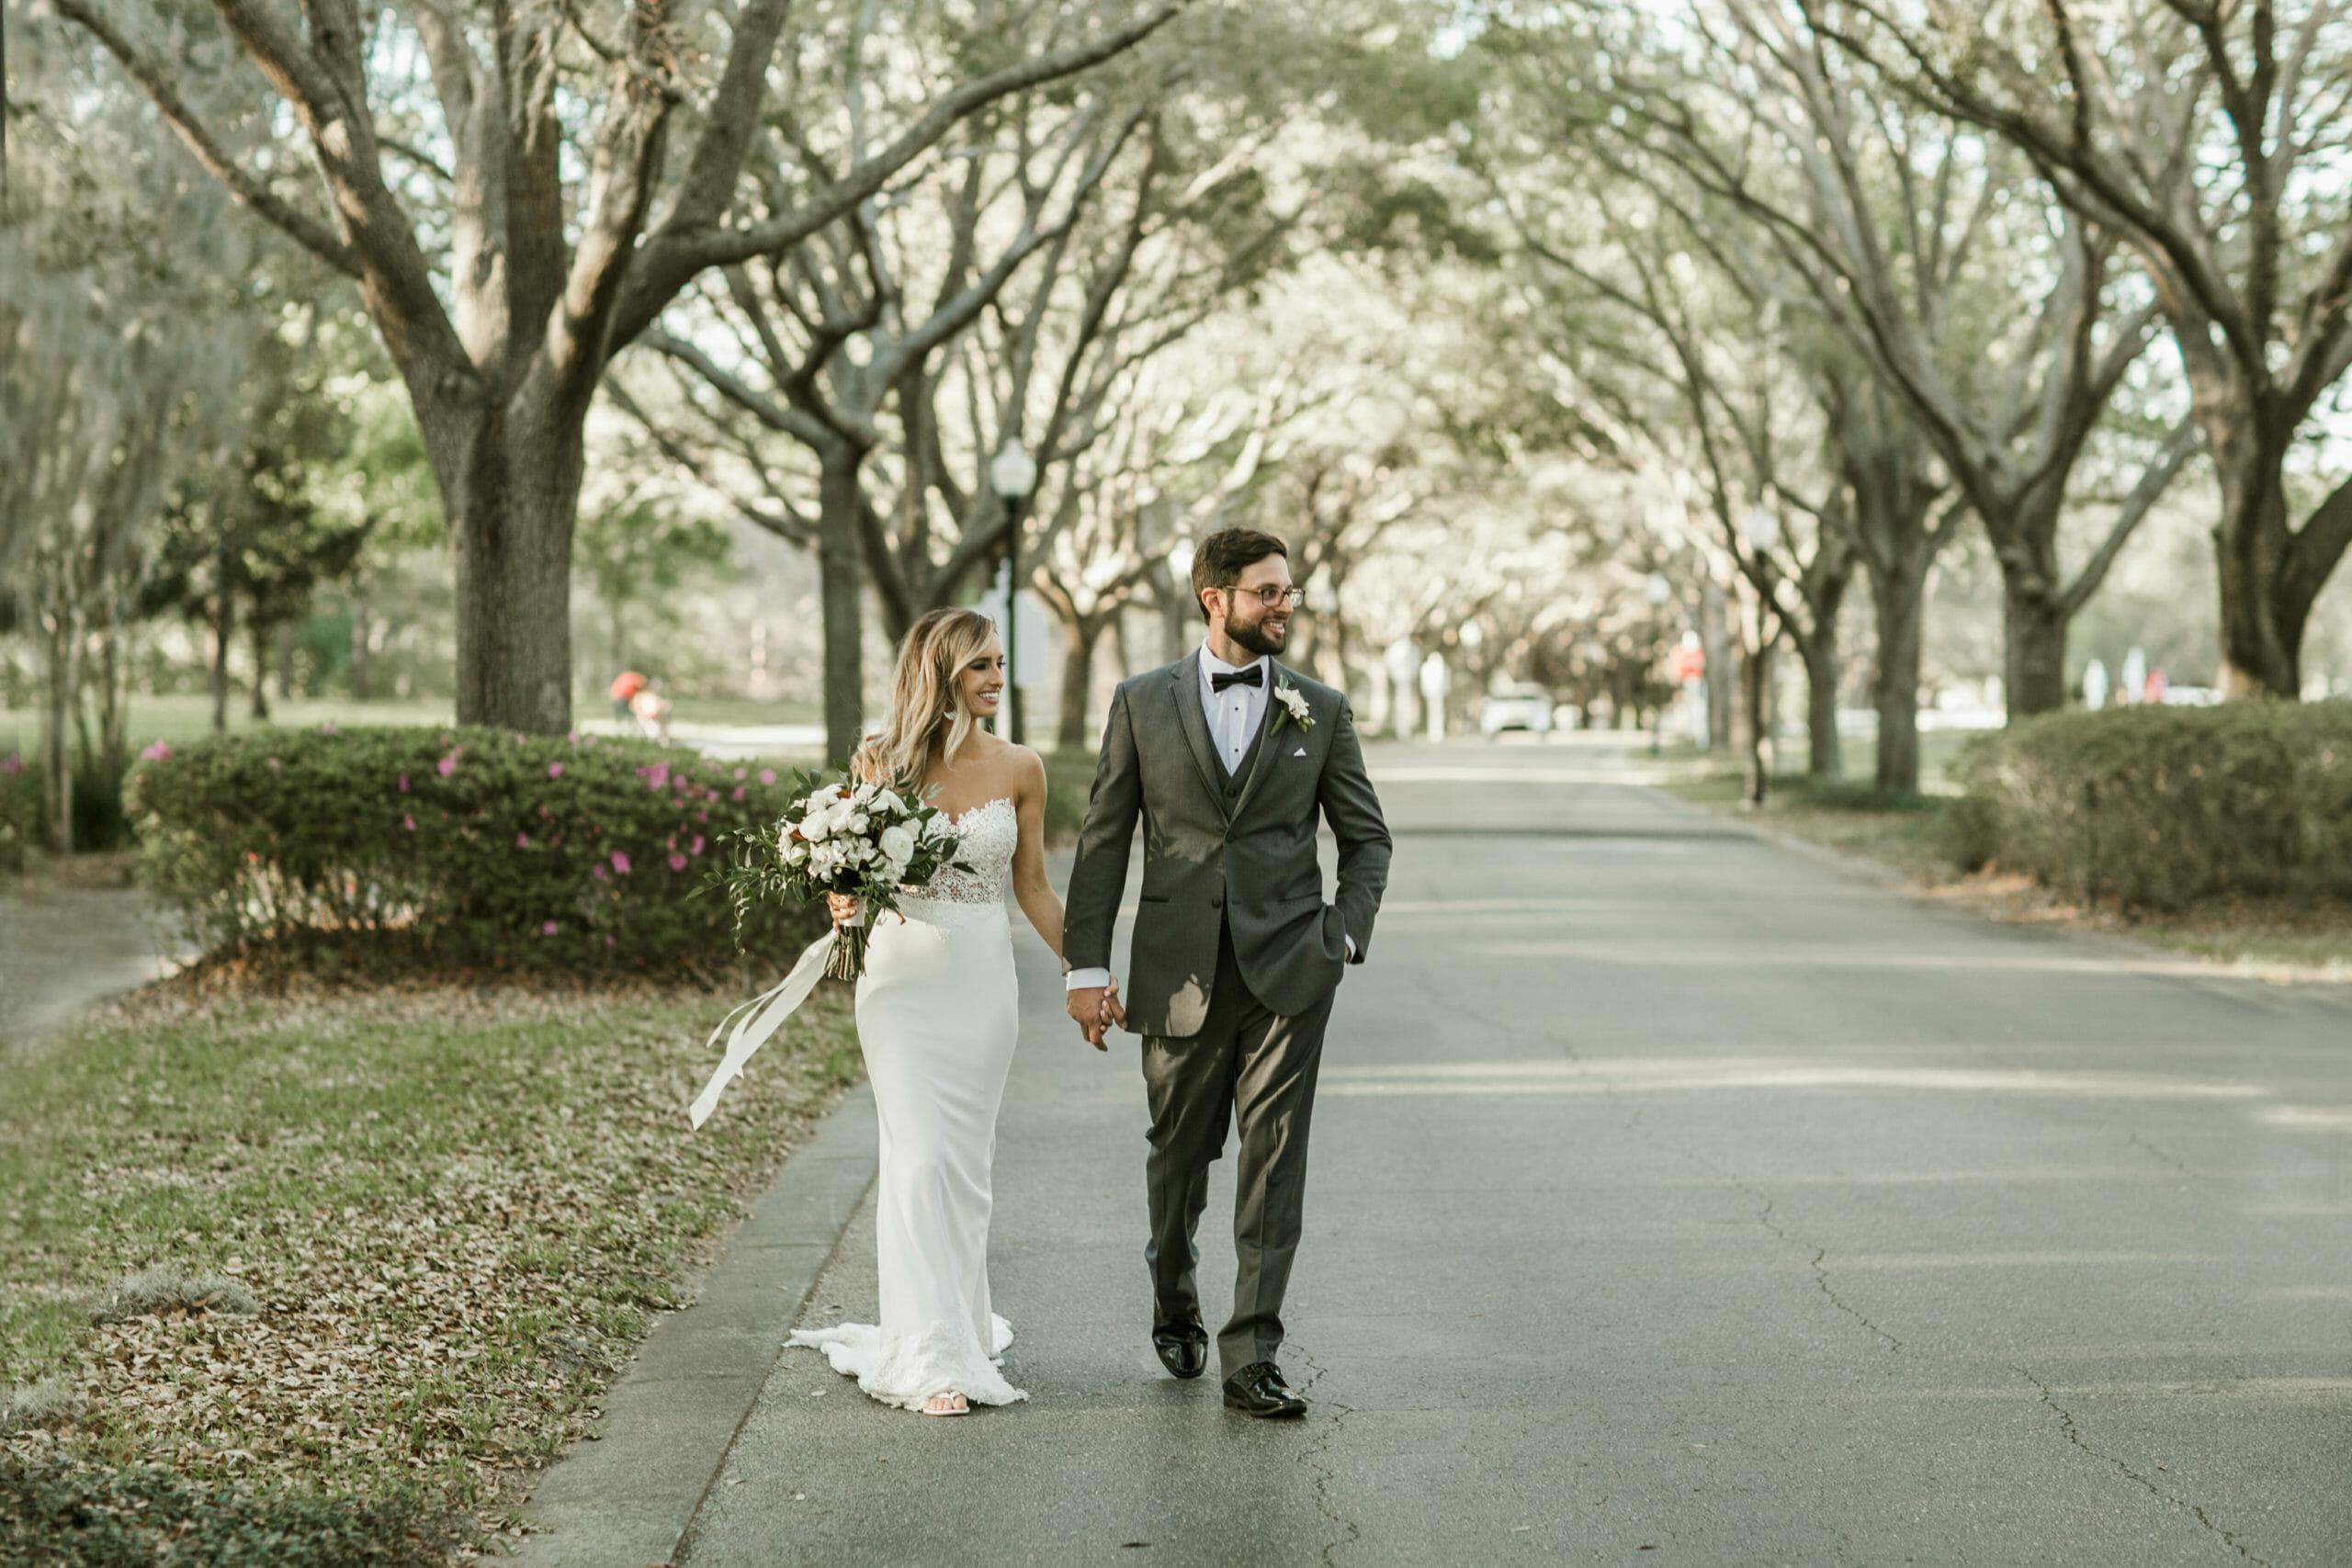 Finny Hill Photography_Travel Wedding Photographers_California Wedding Photographers_Sam Nick_0632